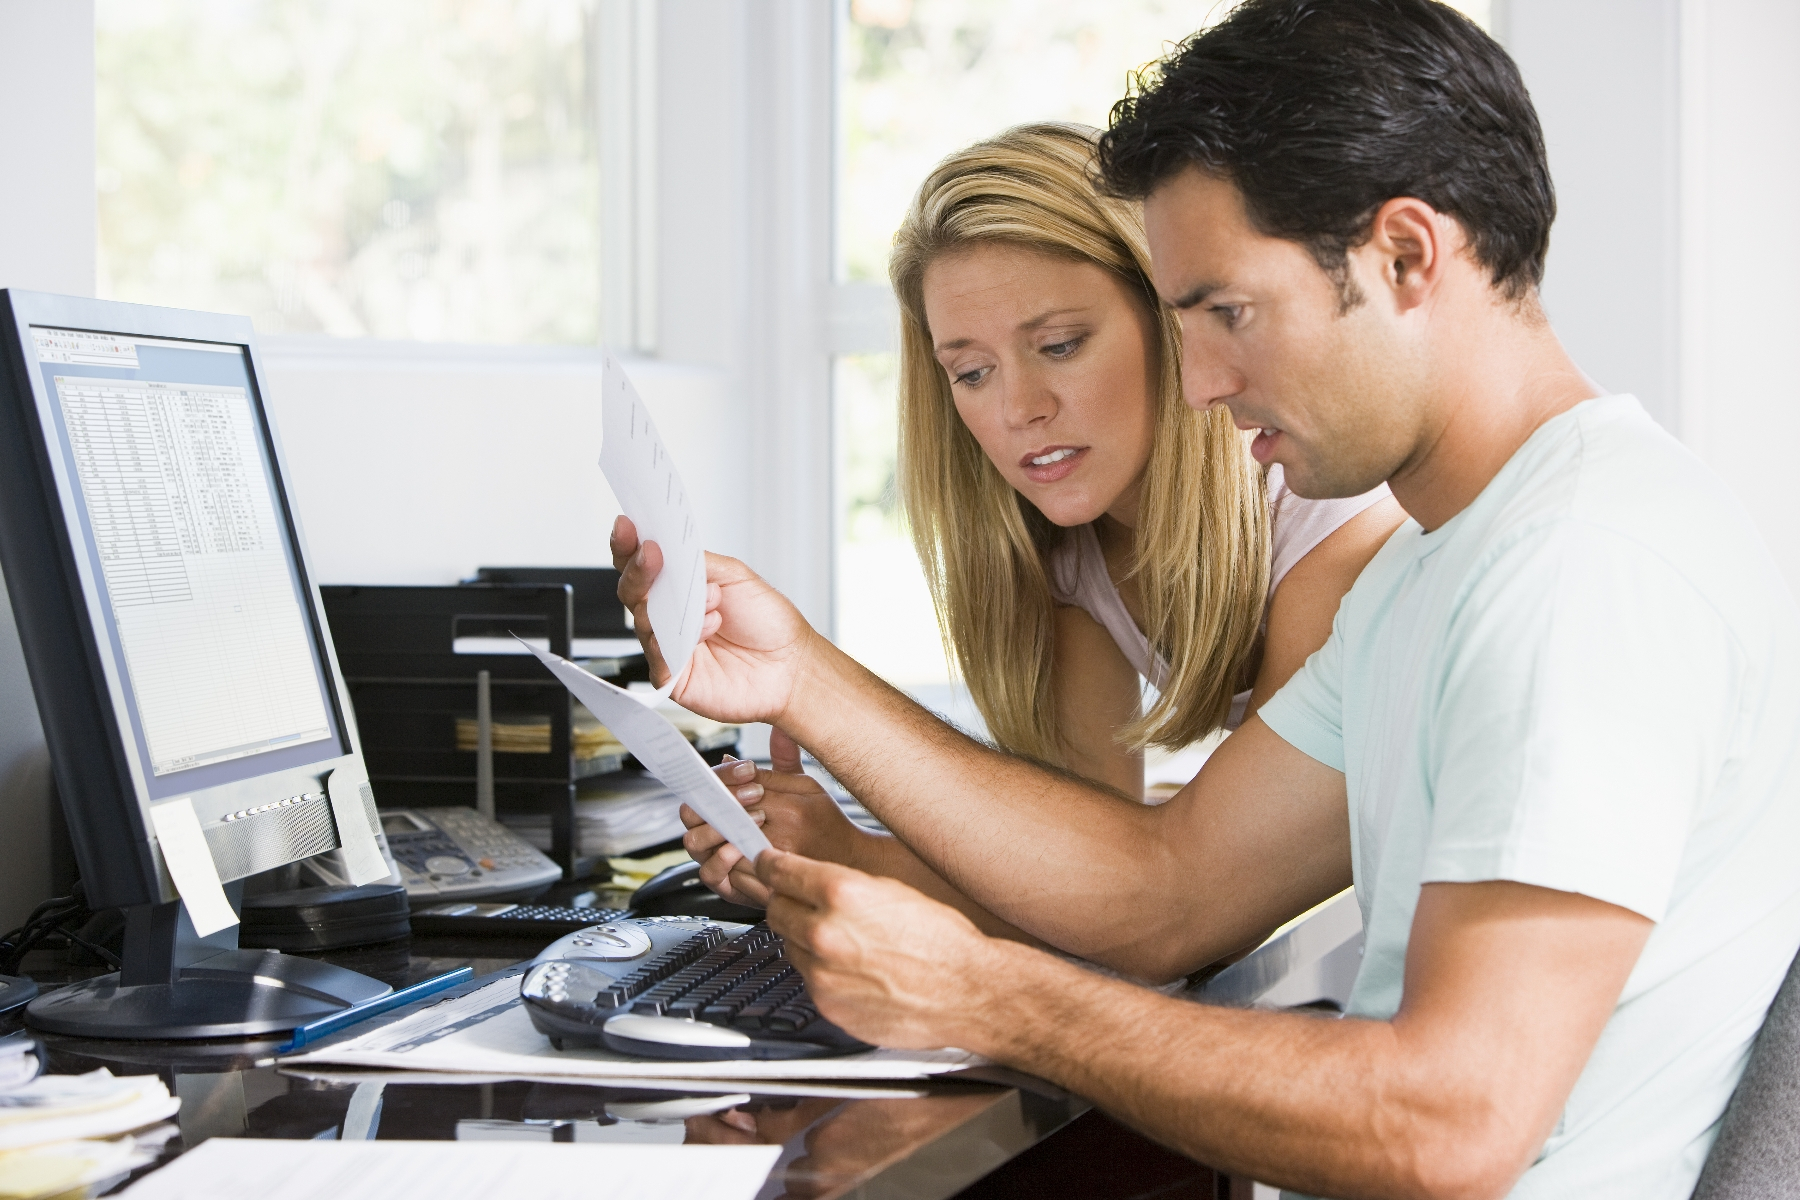 Monroe-Bookkeeper-Notery-Payroll-Consulting-Taxes-Tax-Season-Tax-Professional-Jackson-Hewitt-Notery-Debt.jpg